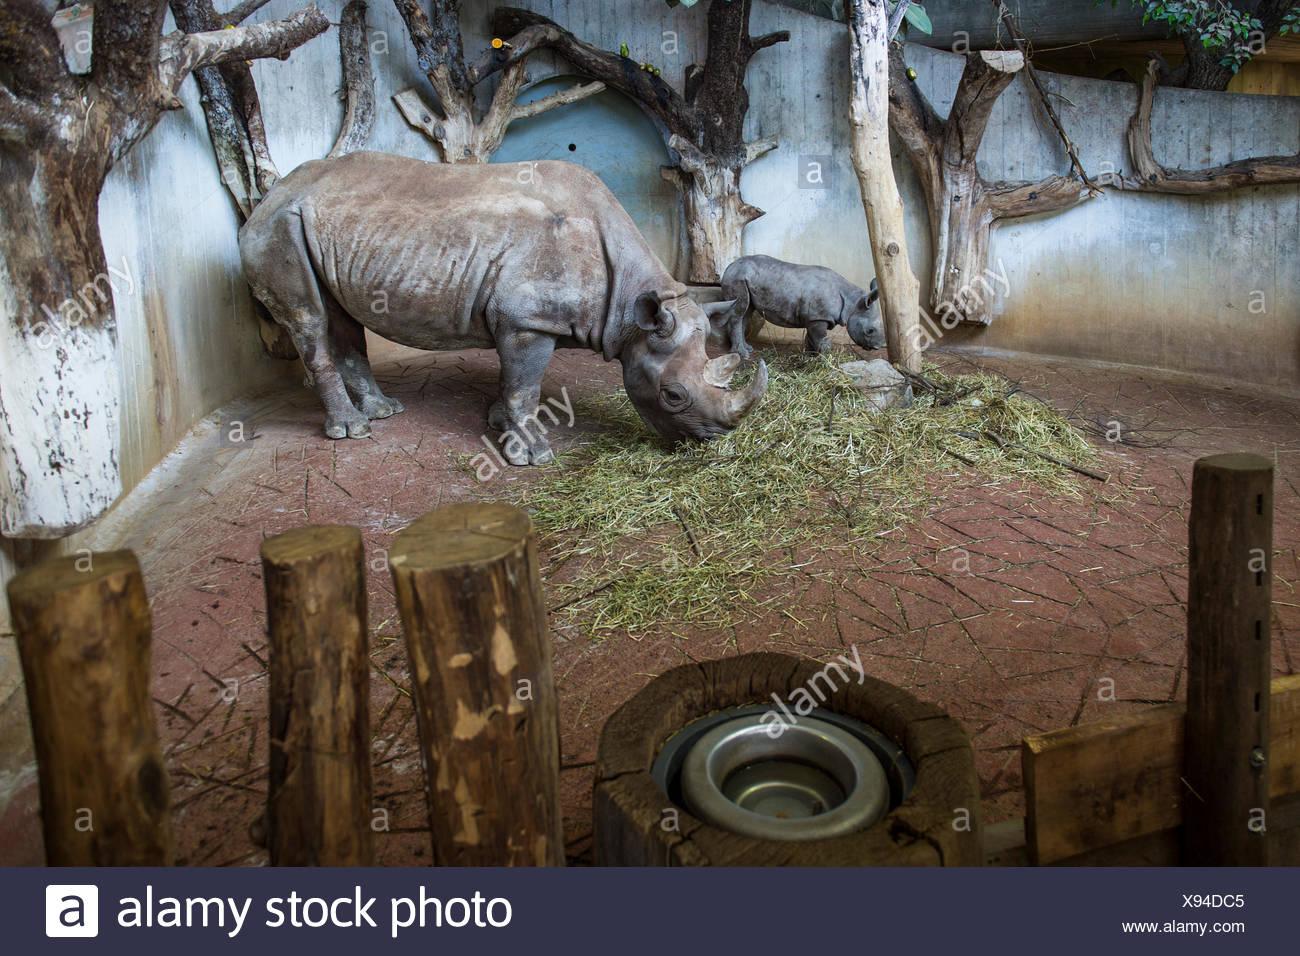 Black Rhinoceros (Diceros bicornis), adult and young, feeding, Zürich Zoological Garden, Zürich, Switzerland - Stock Image